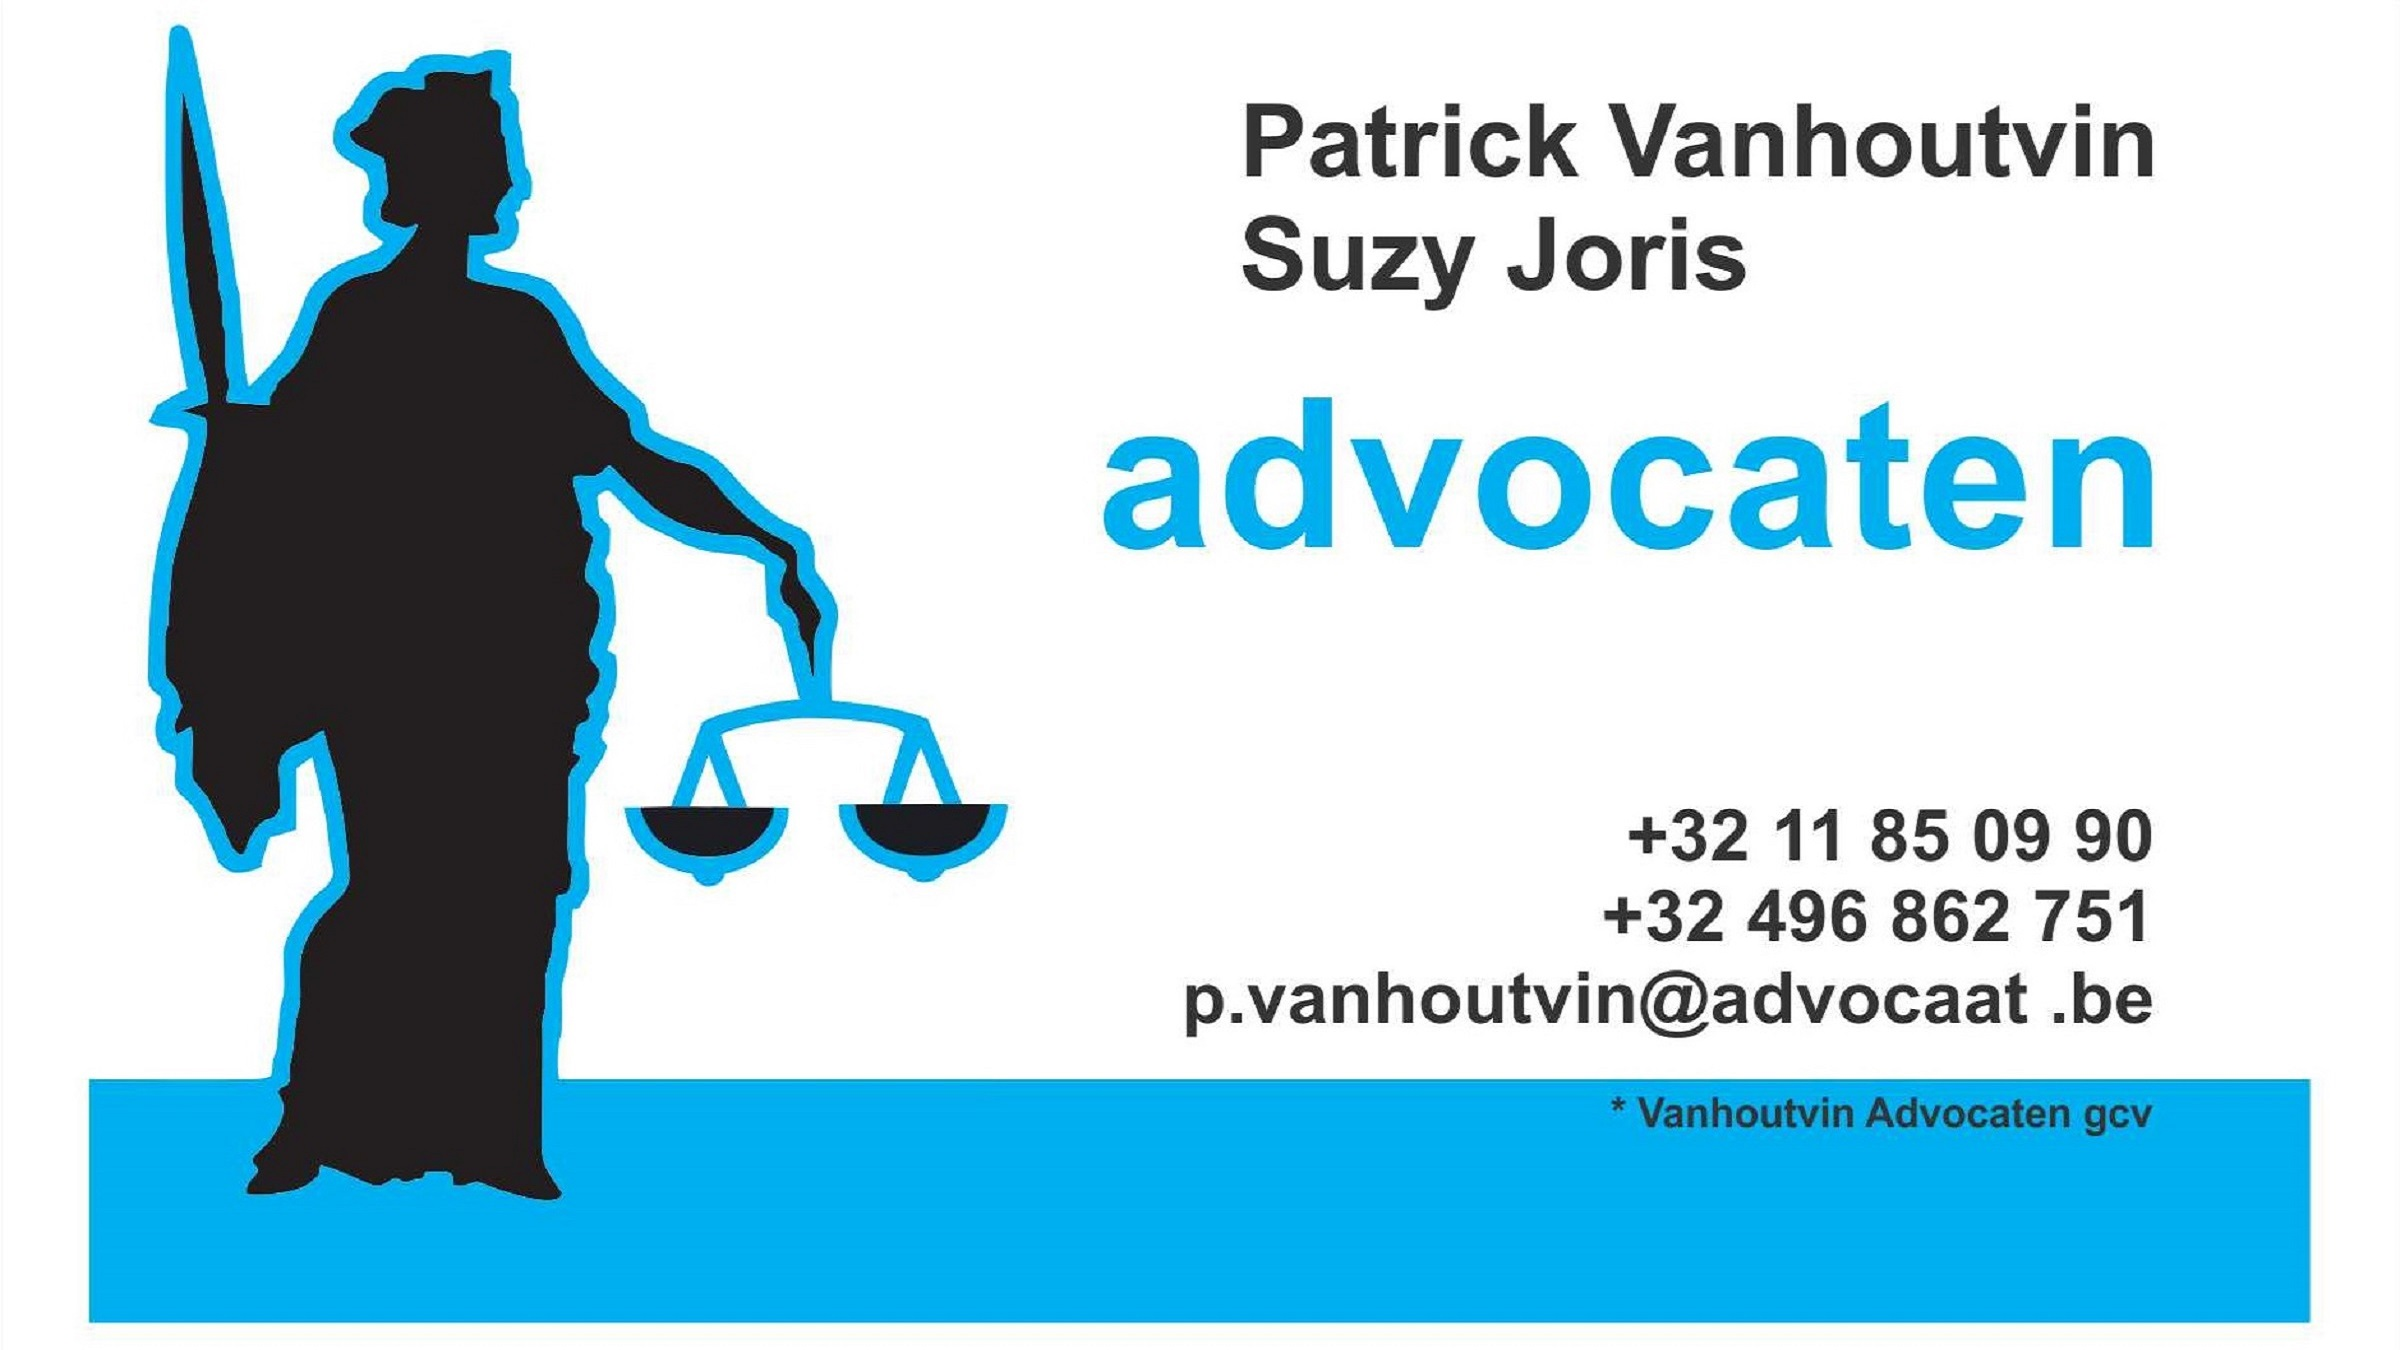 Vanhoutvin Advocaten.jpg